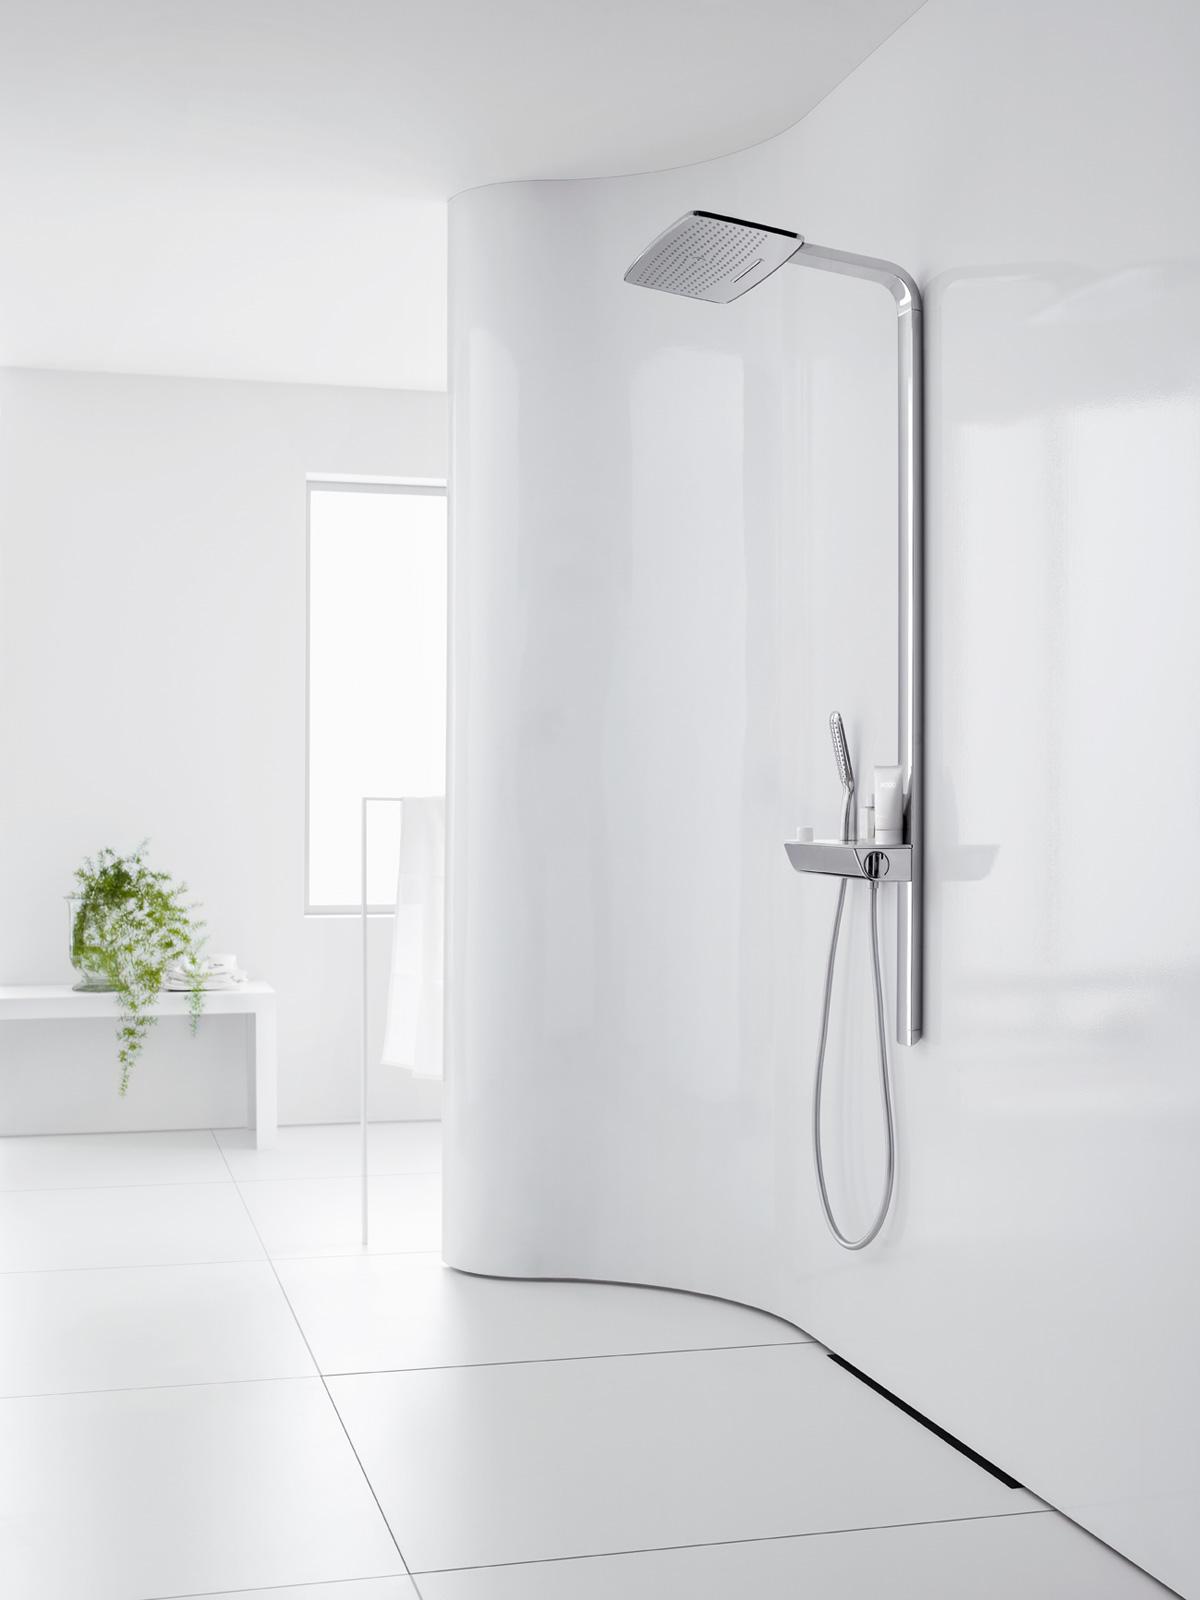 VODOV.BATERIE A_Motiv_3_Showerpipe_ISOv2_72